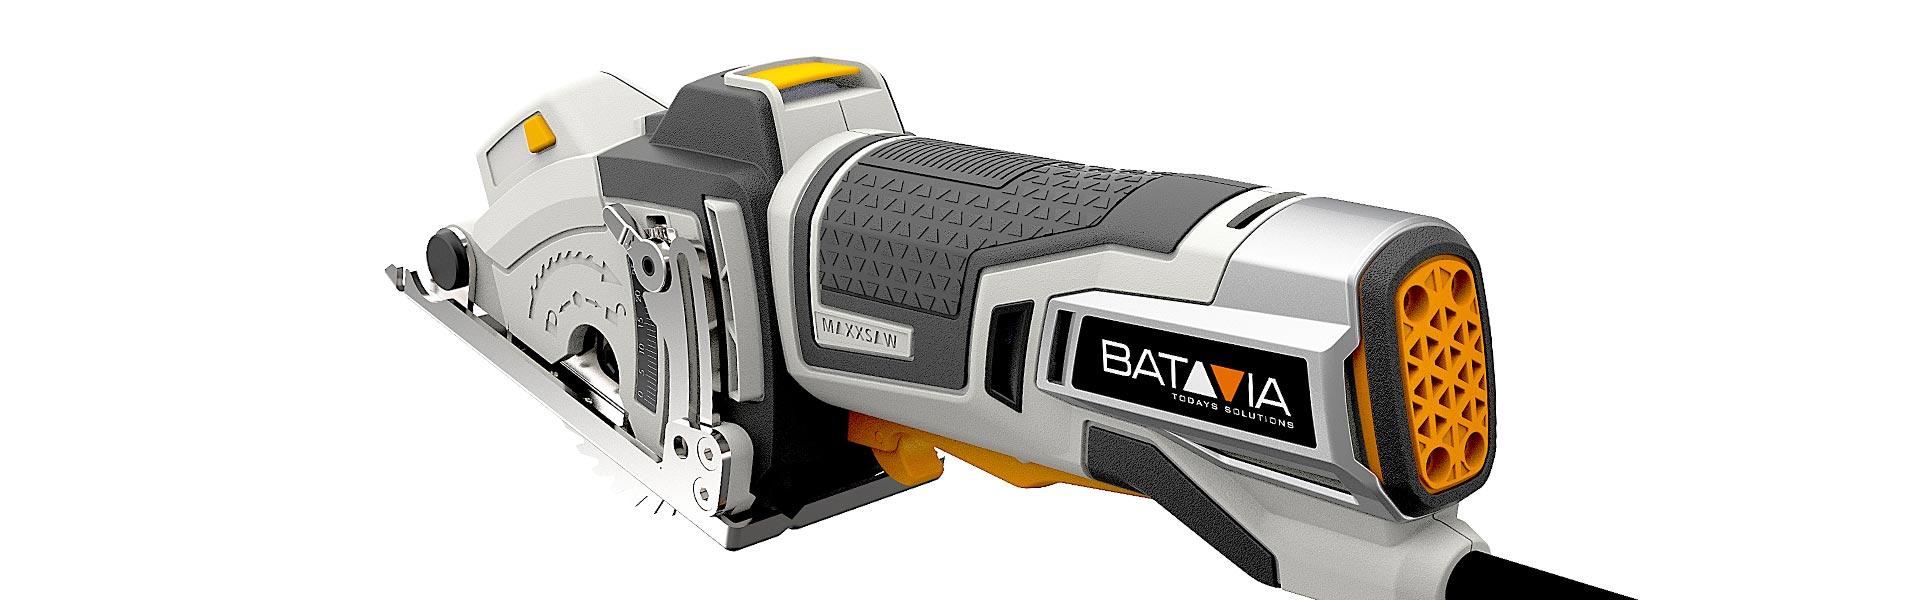 Batavia Minisaw 3